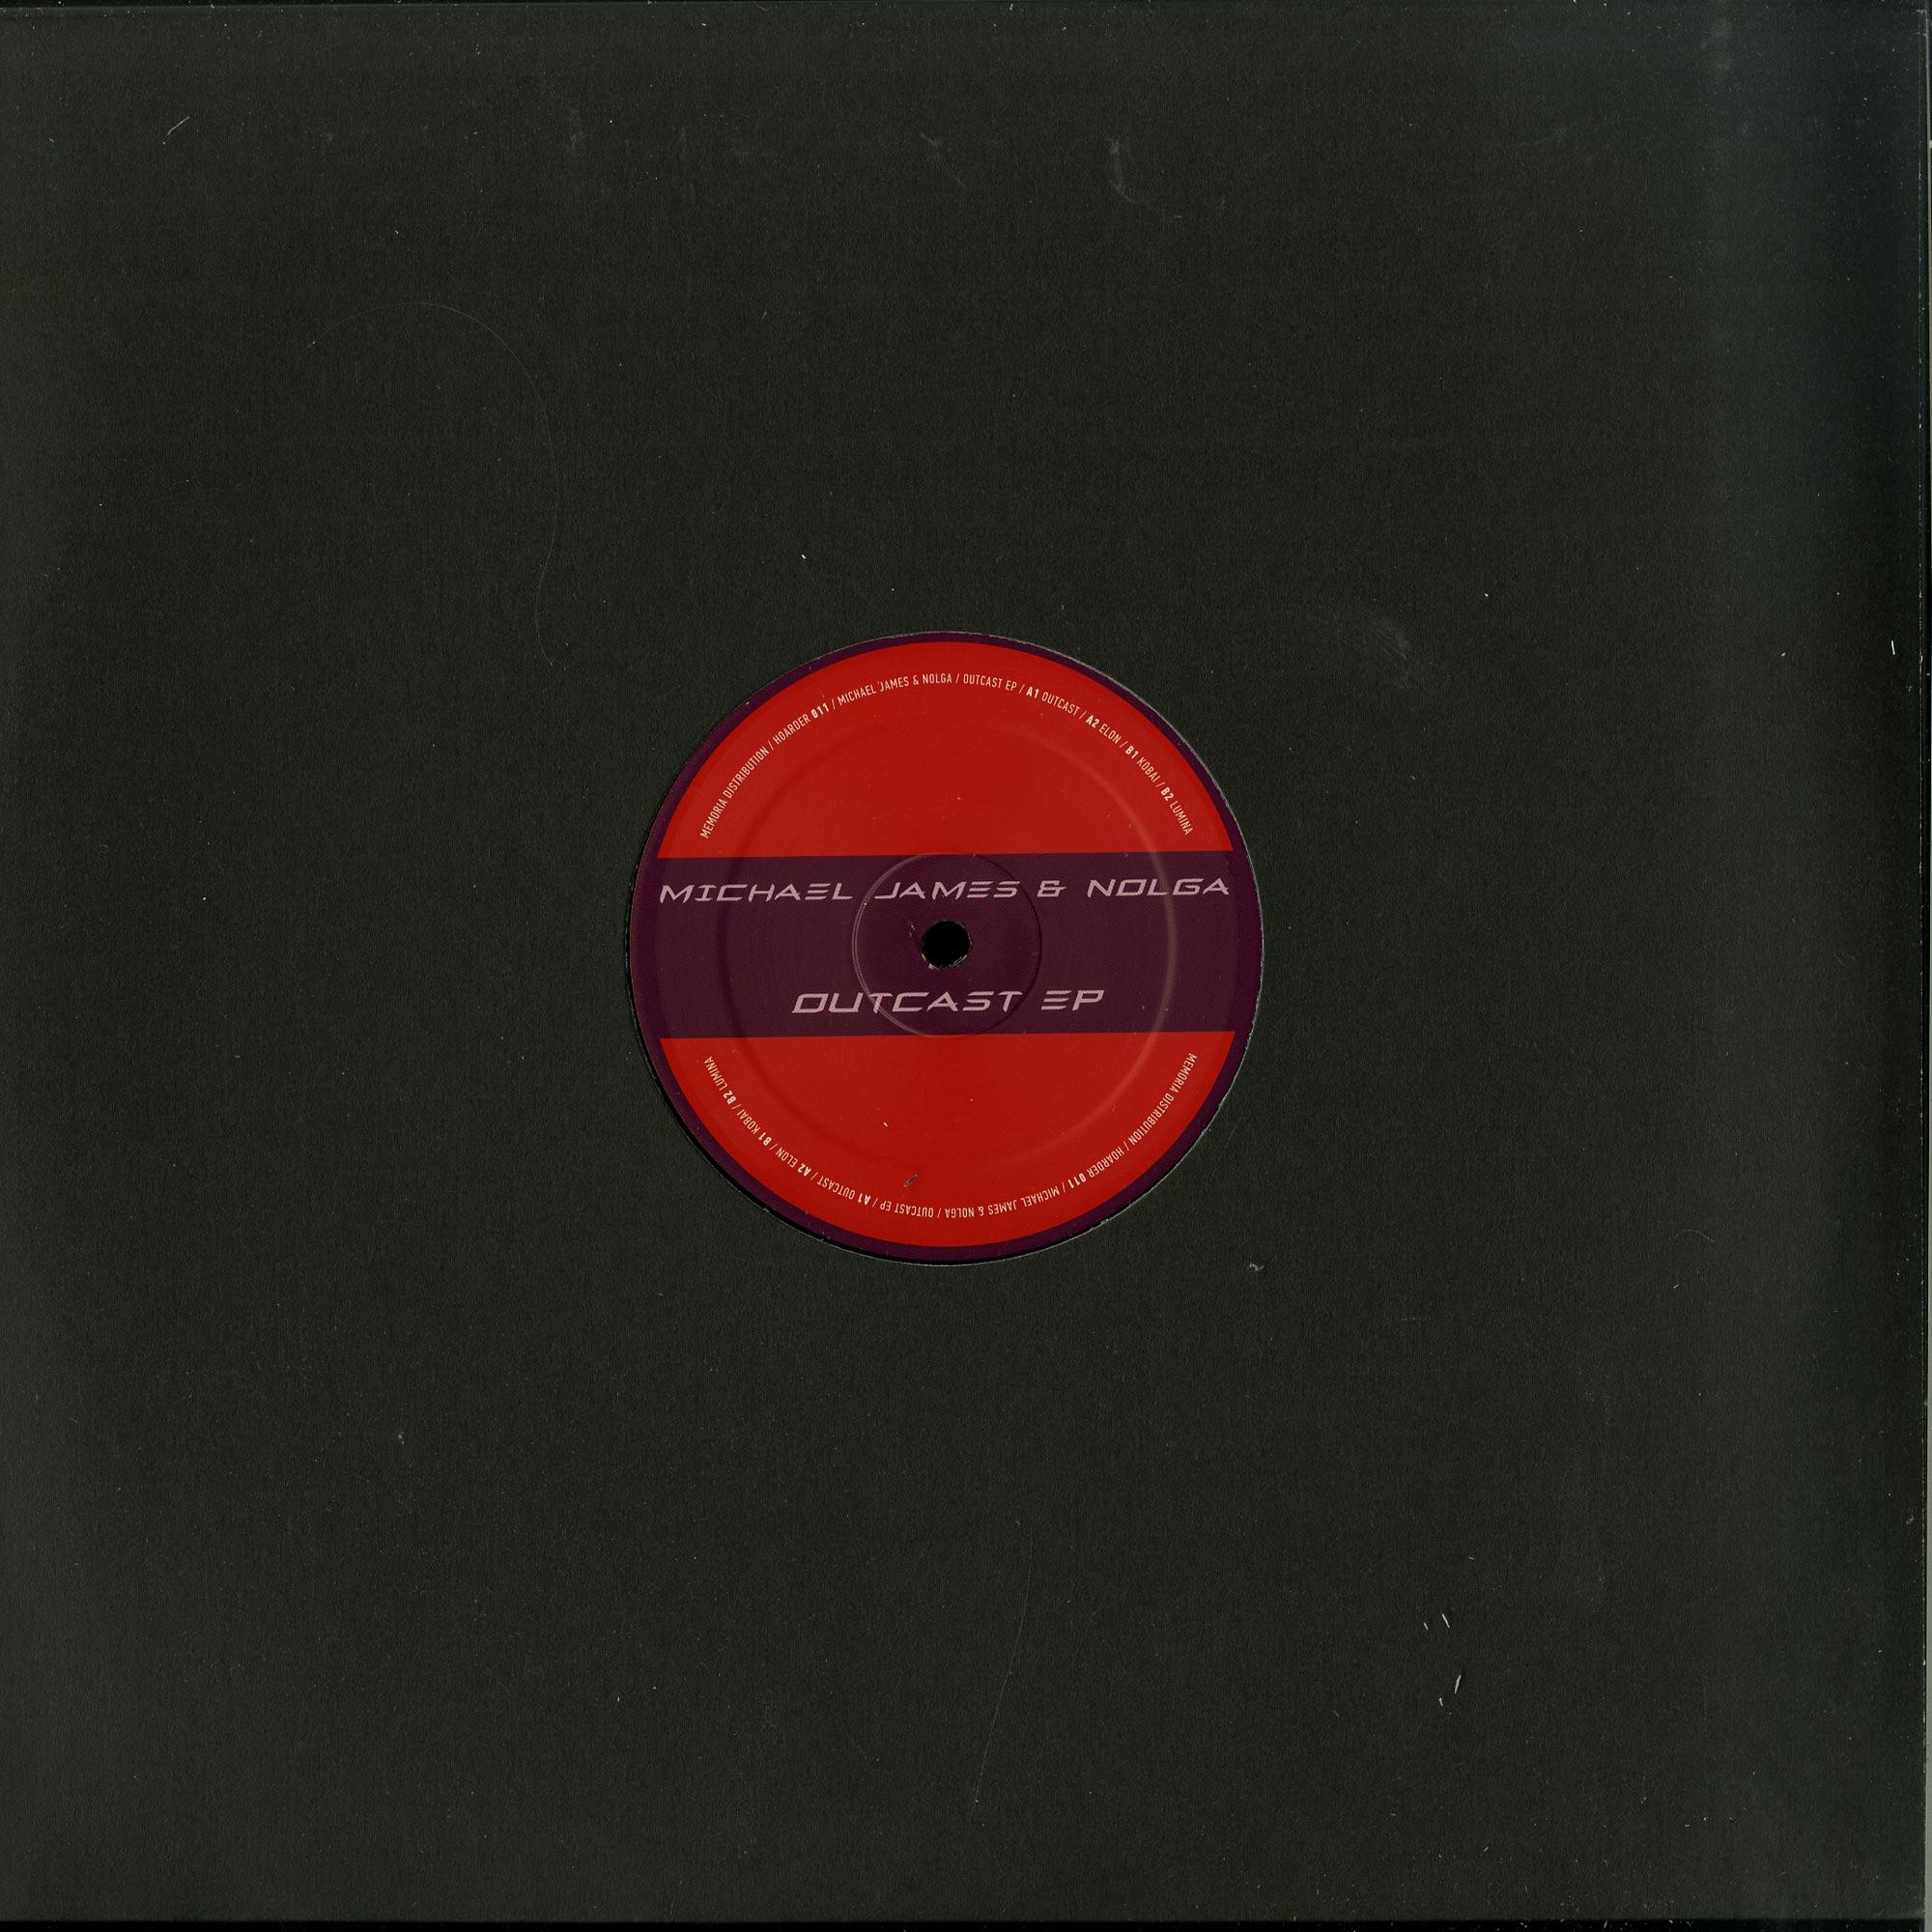 Michael James & Nolga - OUTCAST EP